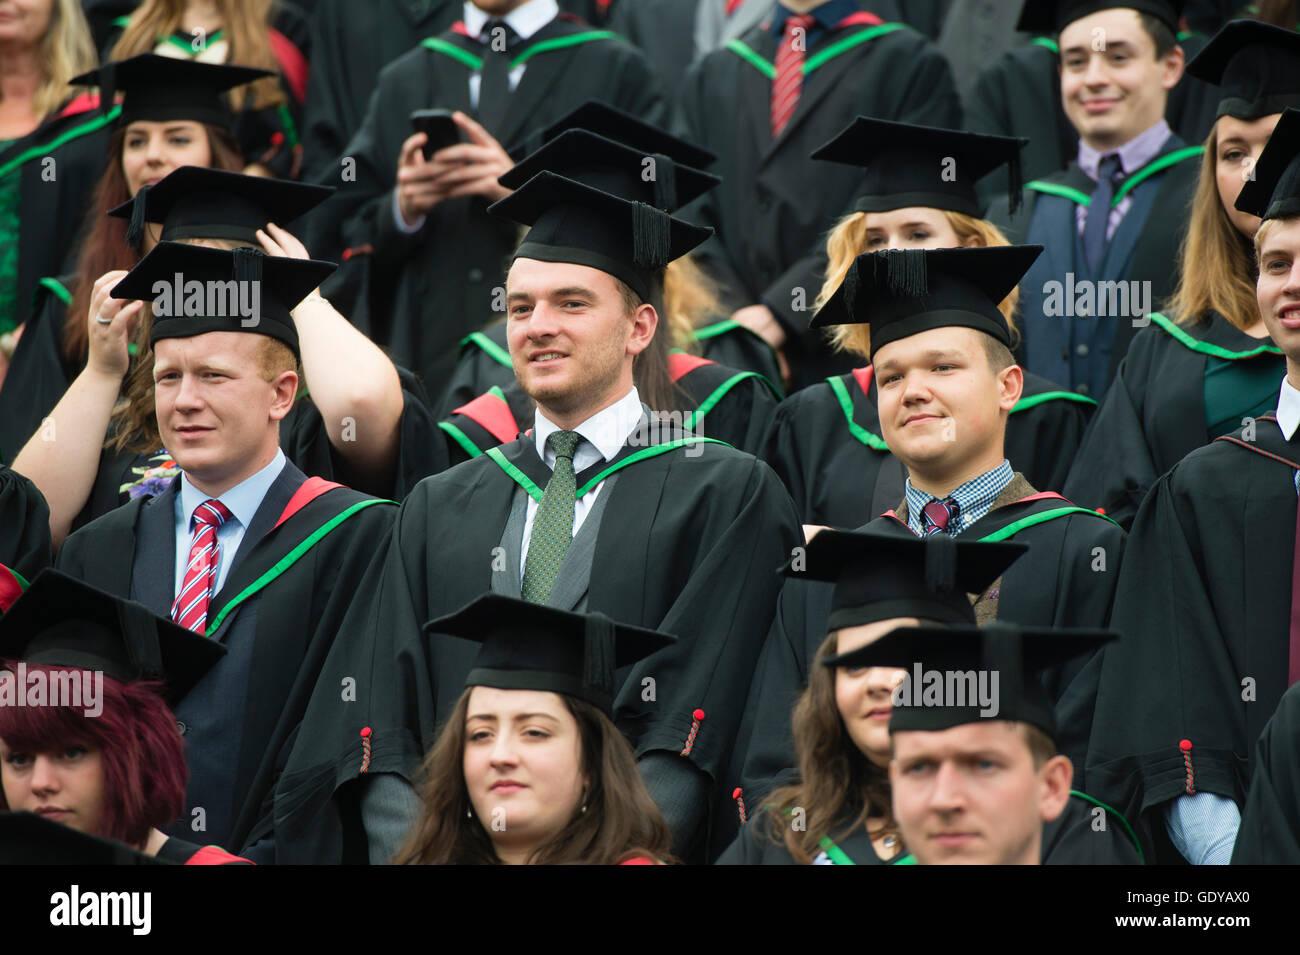 aberystwyth university sya jya programme